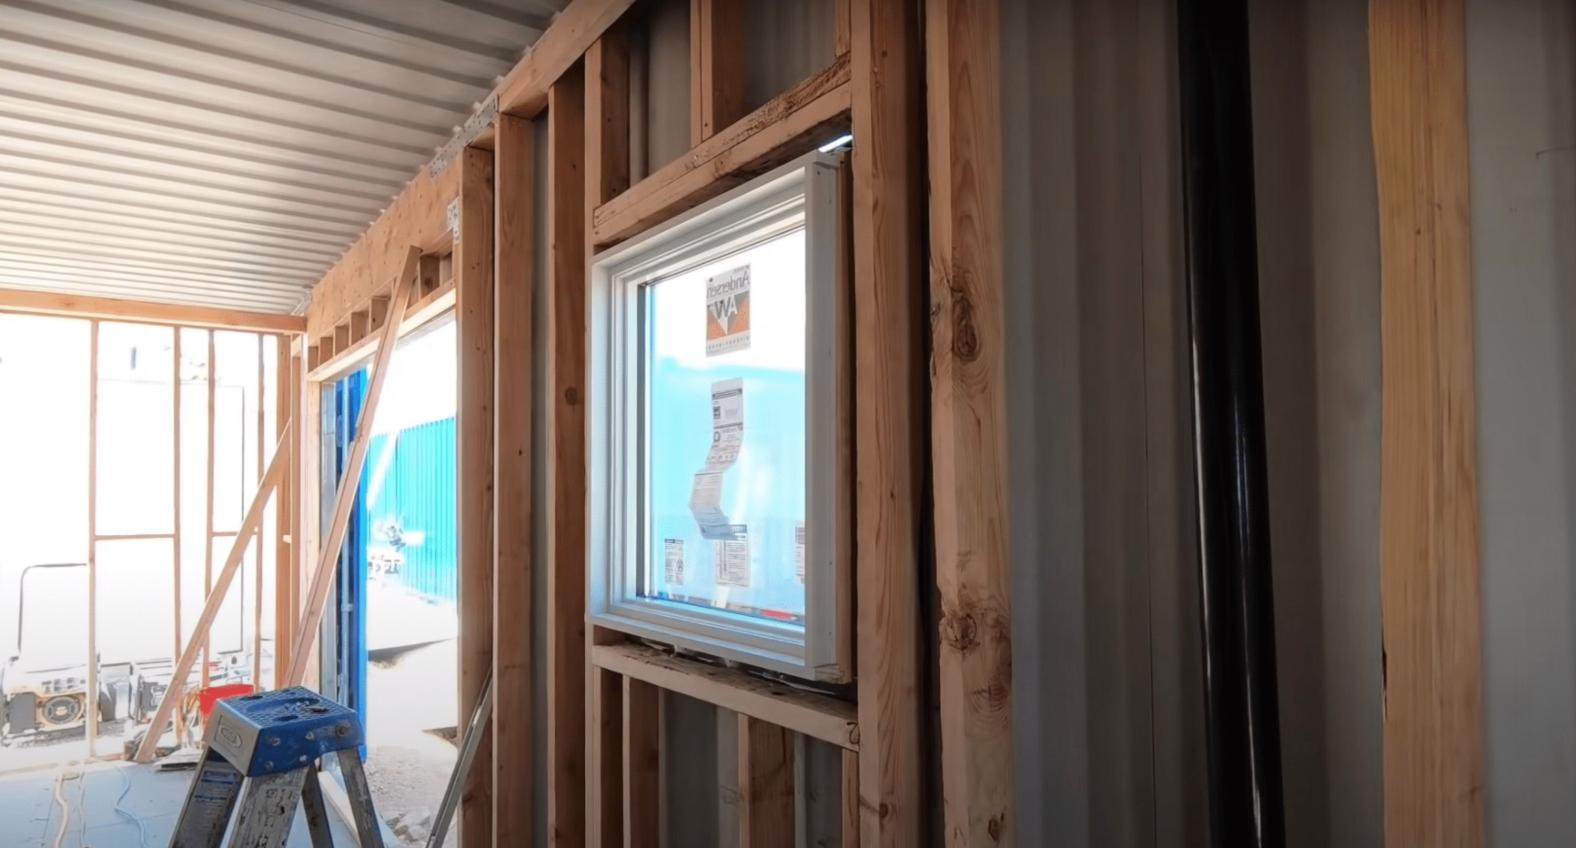 ventana-construccion-casa-container